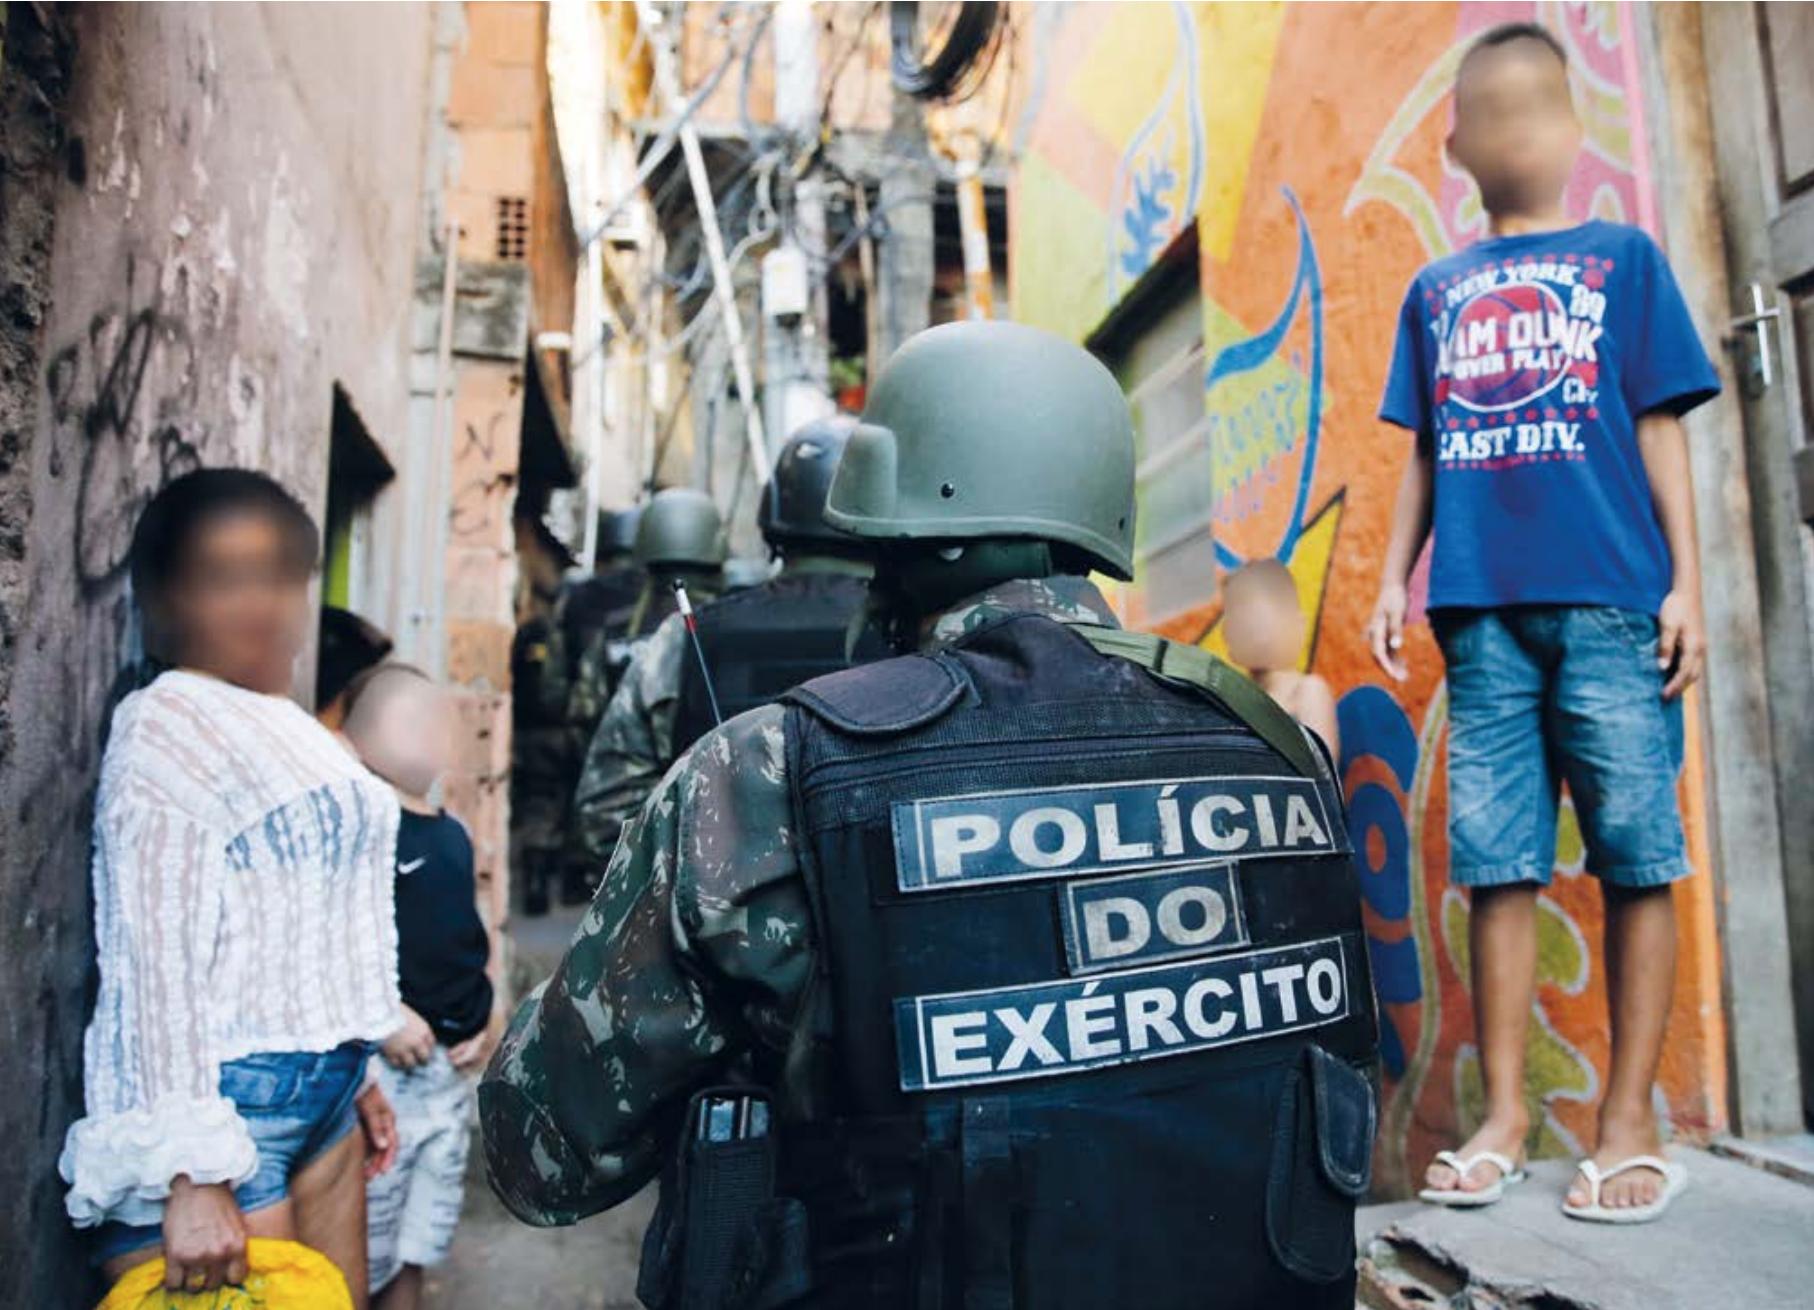 Brazil image credit Frazão/Agência Brasil CC-BY-2.0